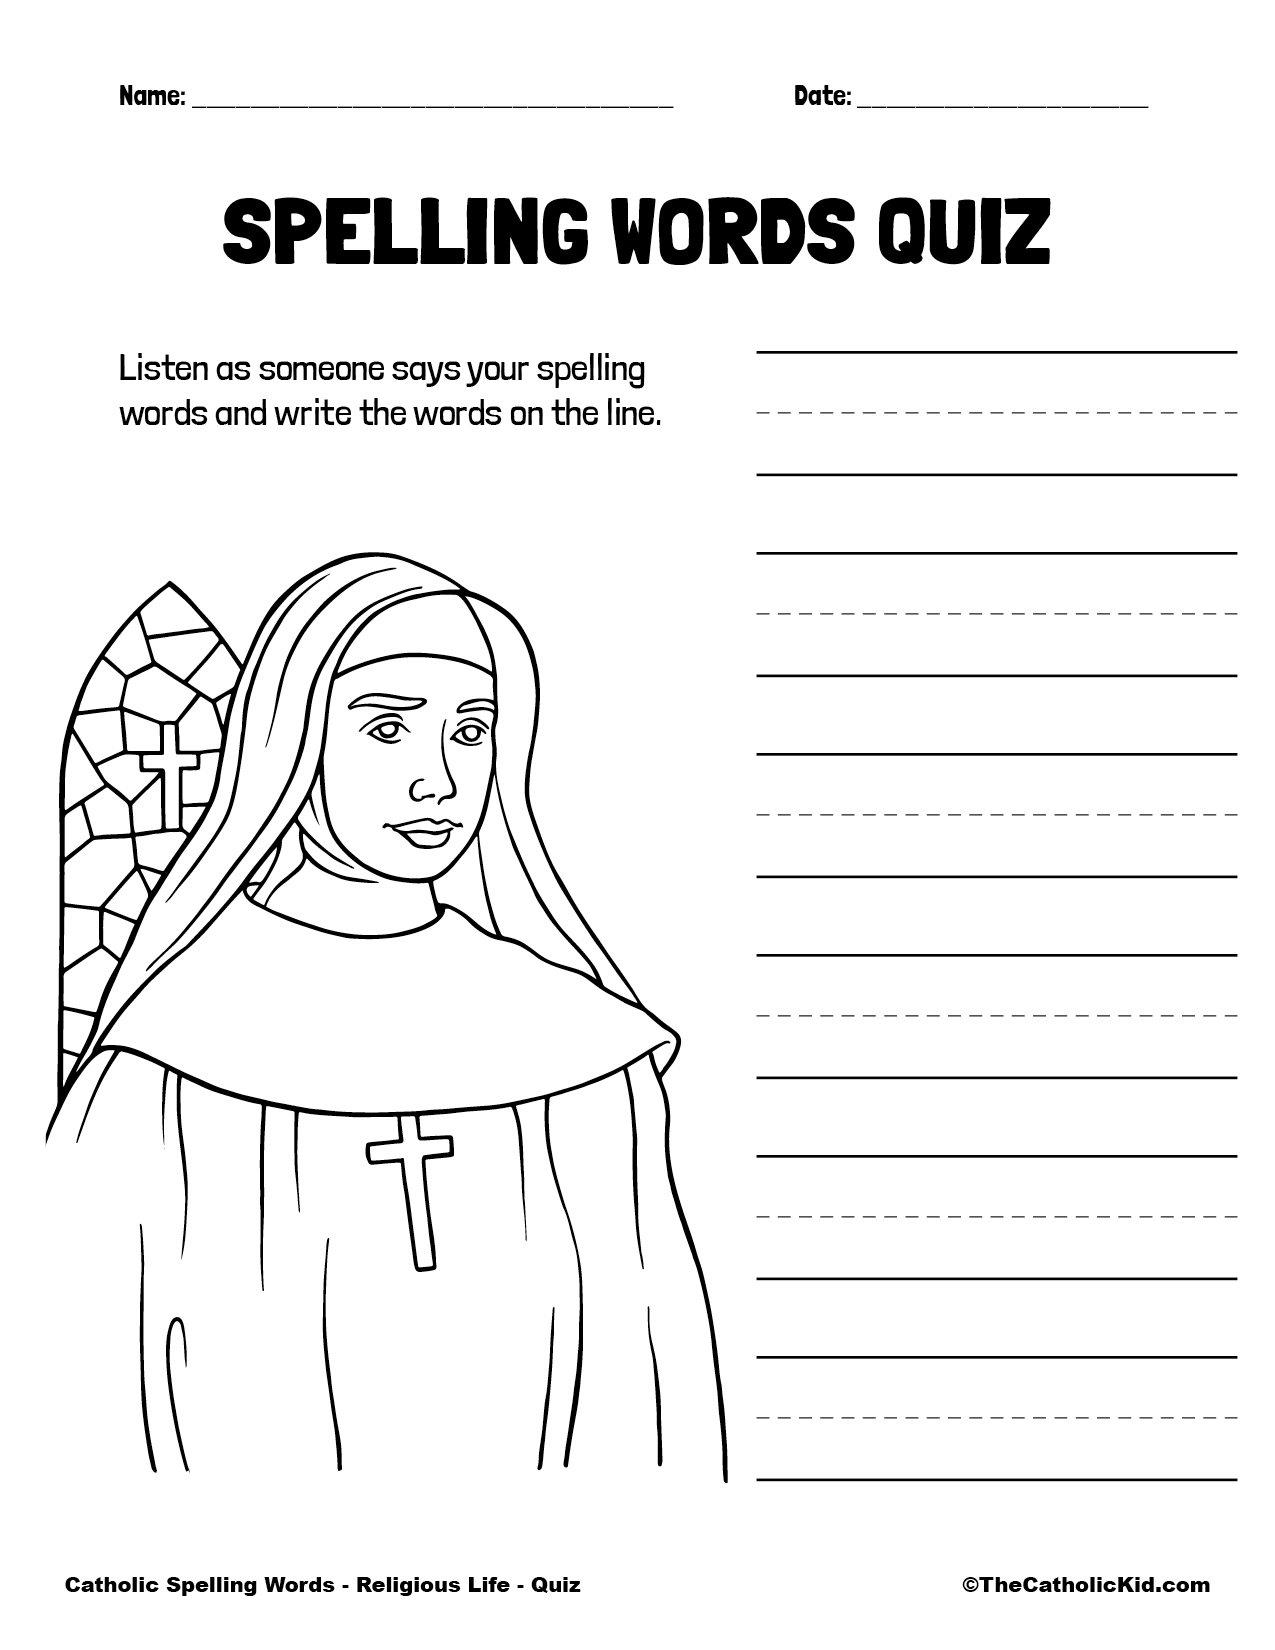 Catholic Spelling & Vocabulary Words Religious Life Worksheet 5 Quiz